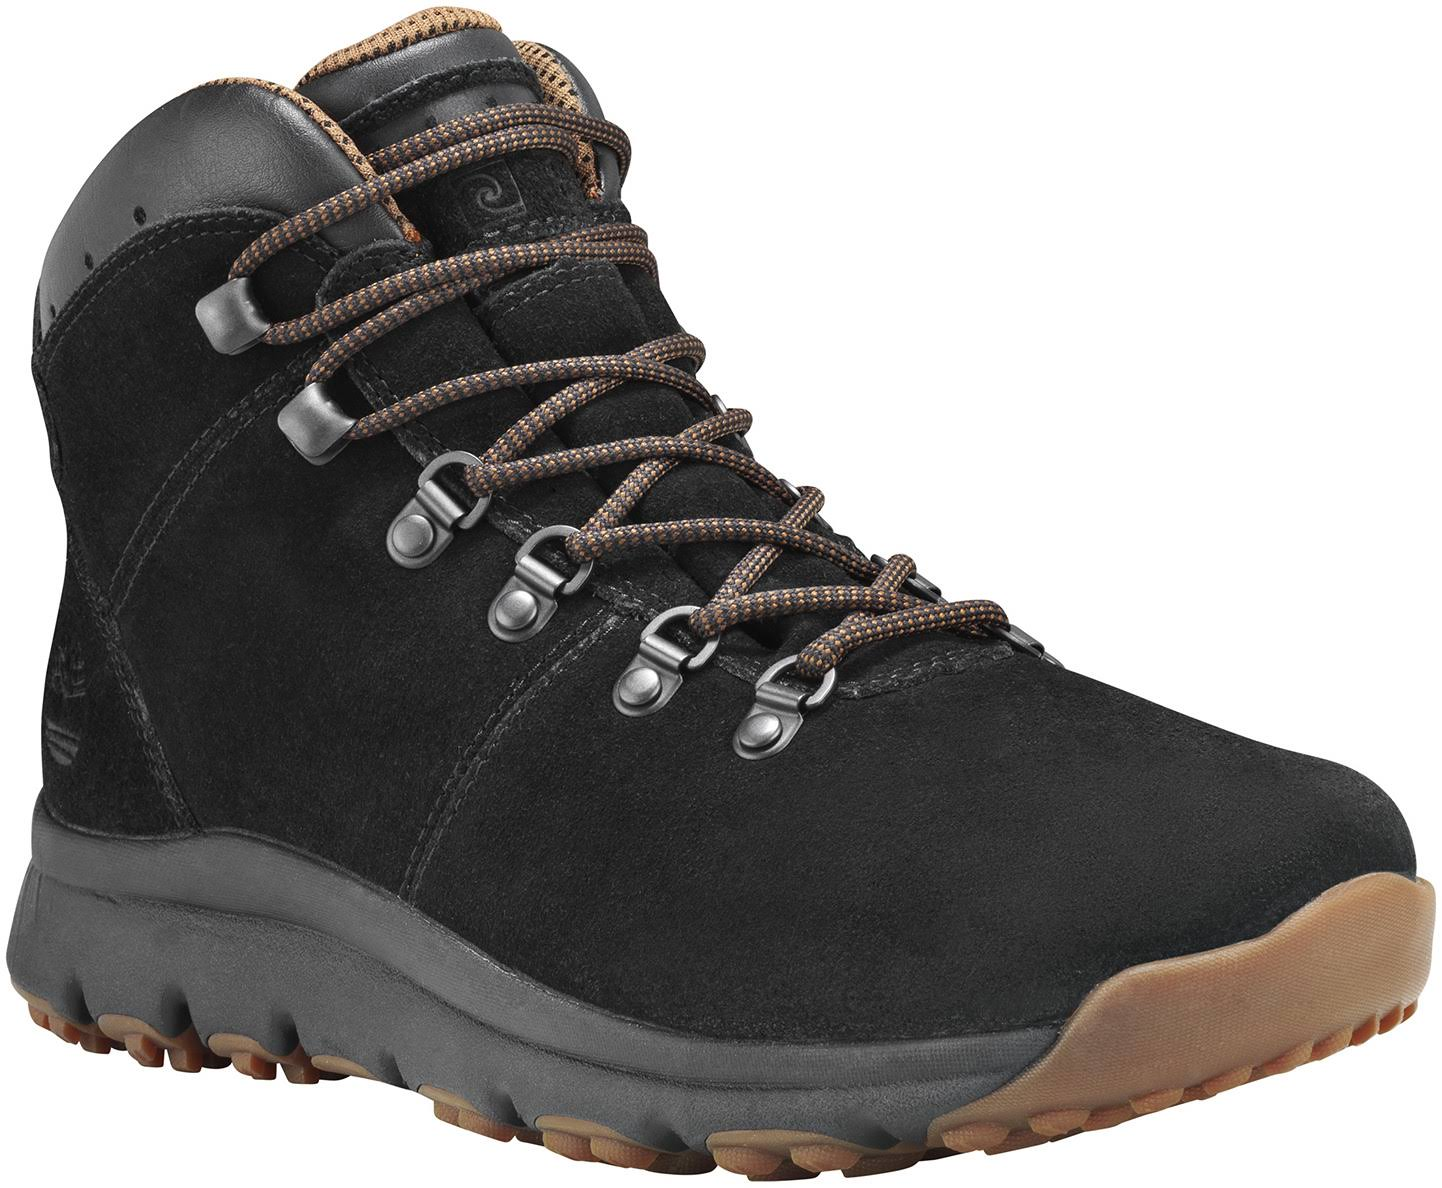 World Hiker Timberland 5 Taglia Nero 43 Black Stivaletti Uomo Per nS4qH4xp